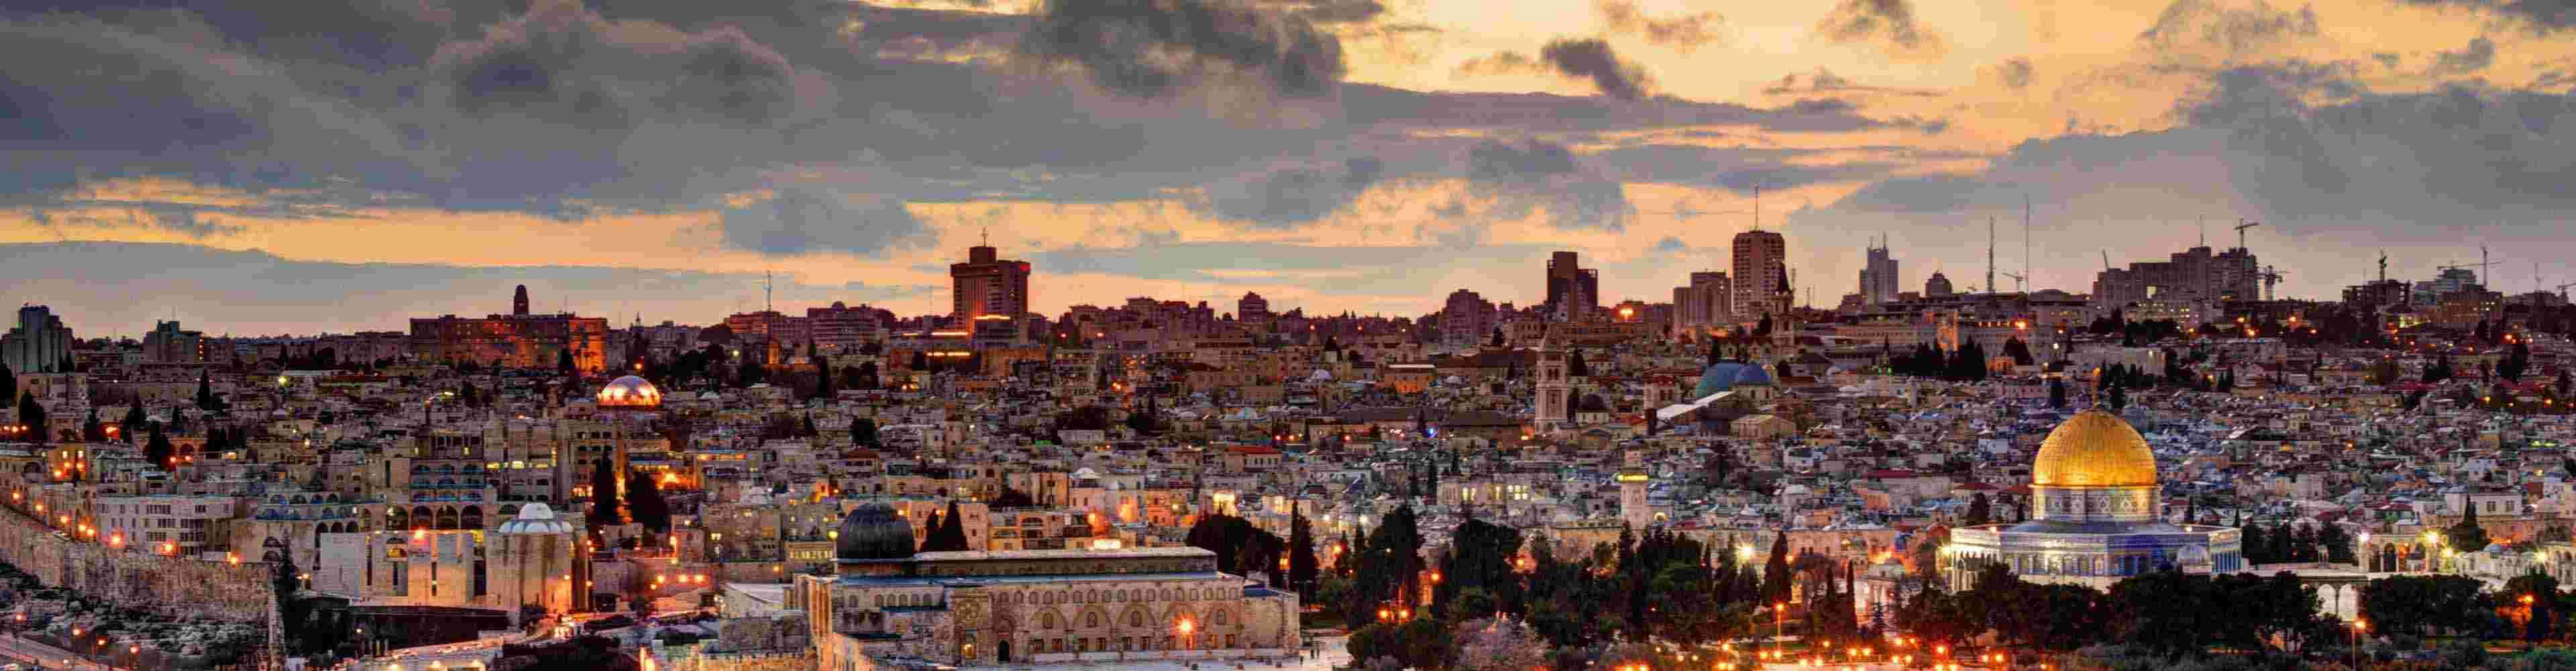 Israel Tel Aviv Skyline Dusk